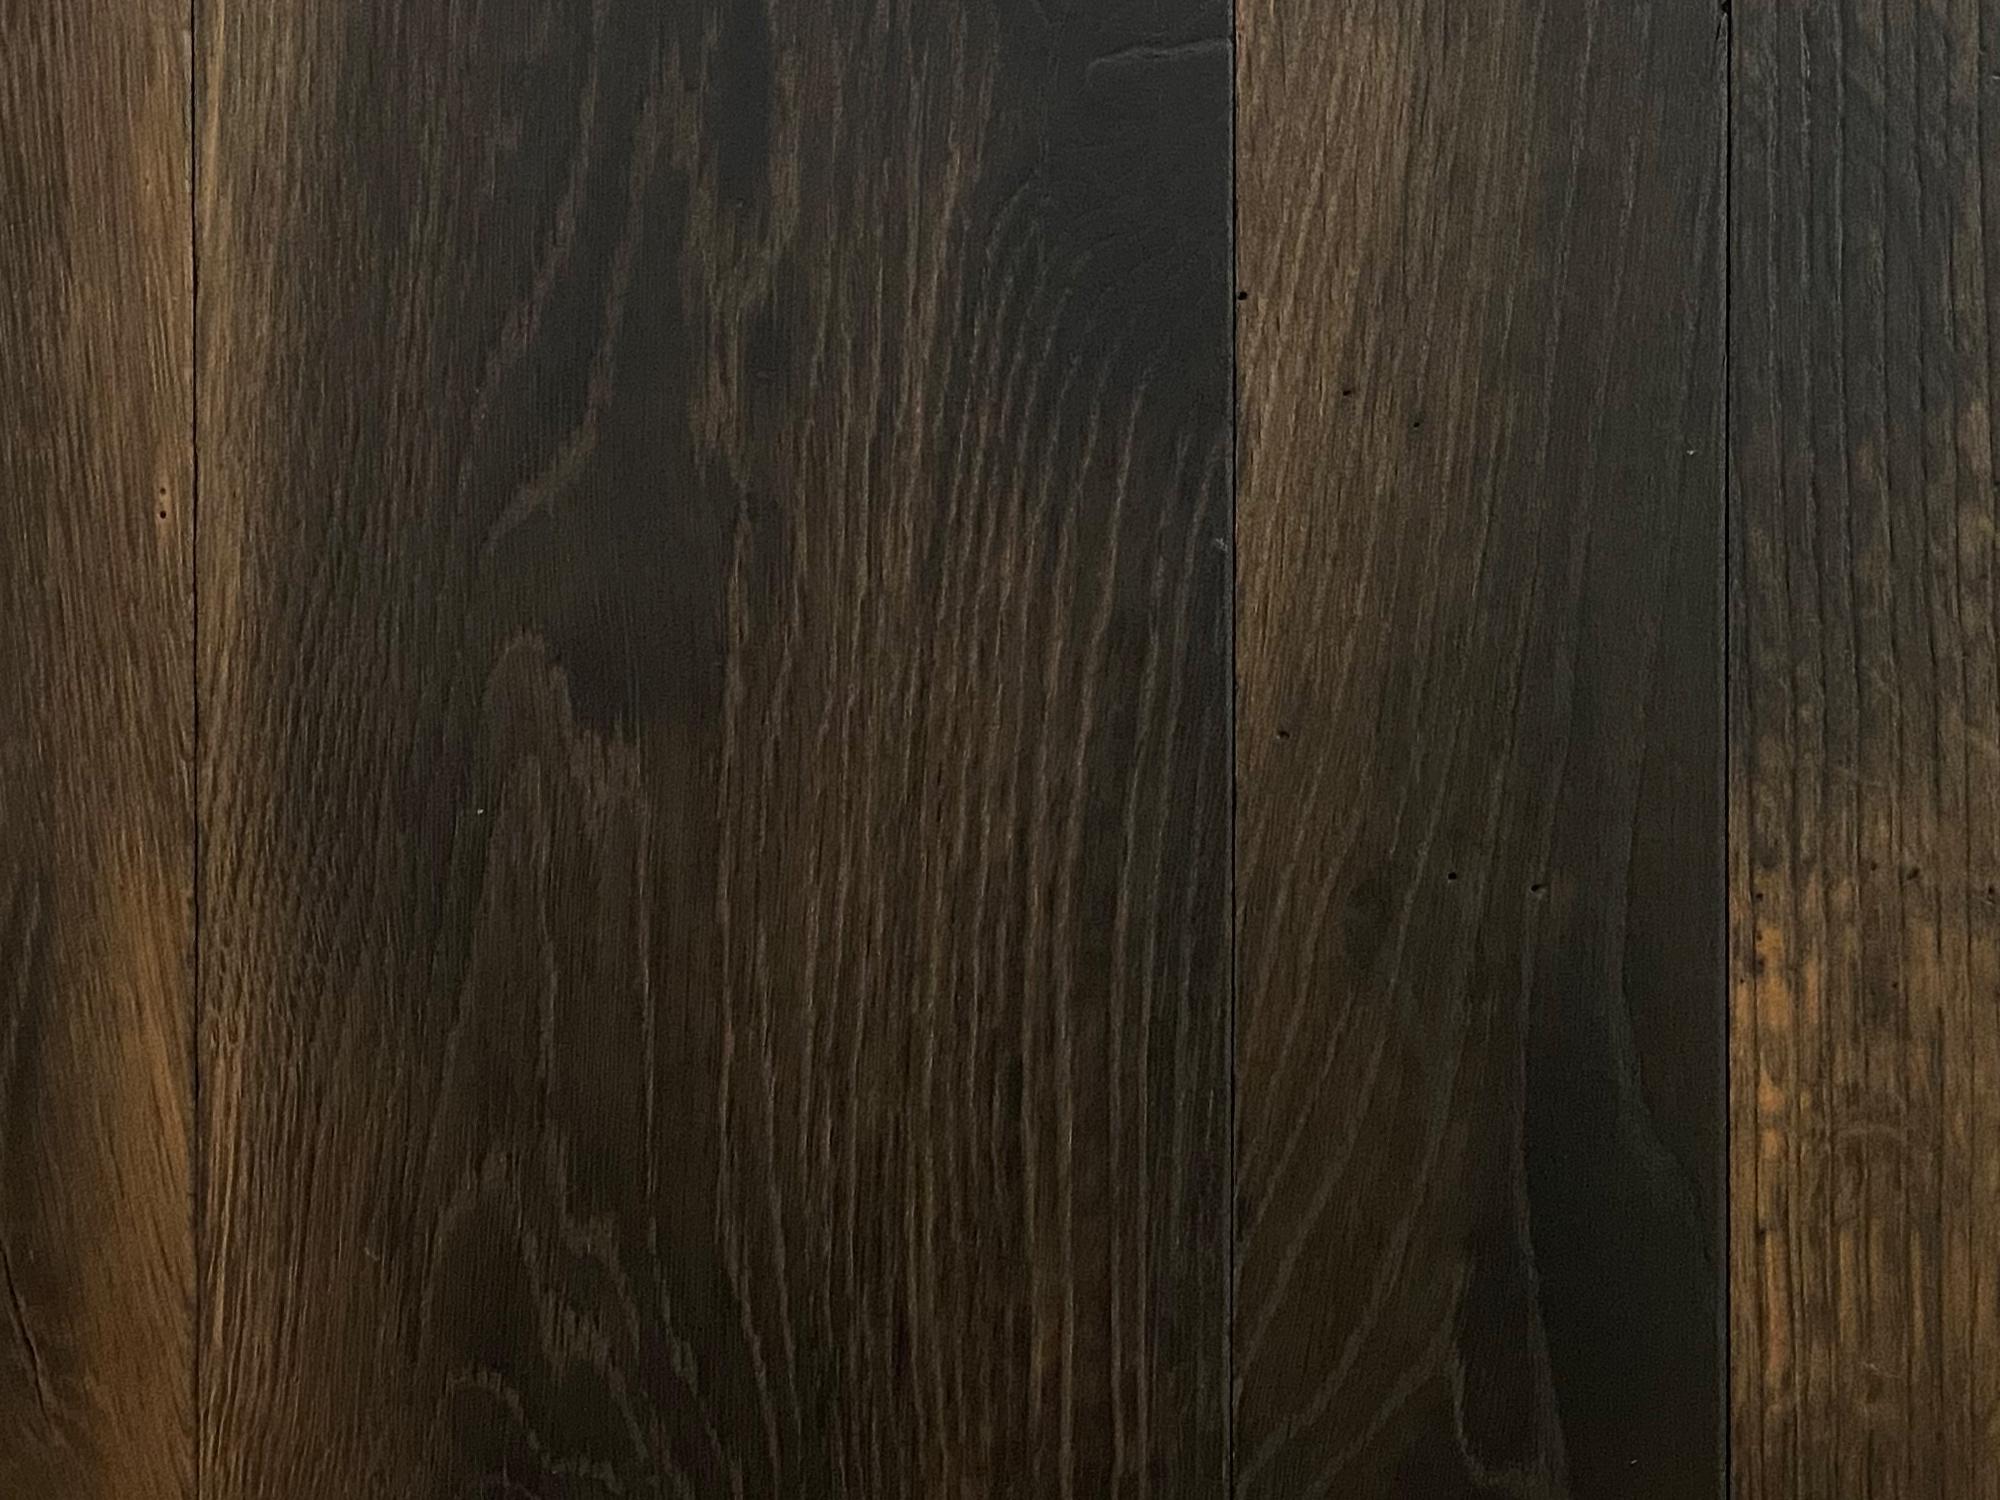 Oak grain running through flooring